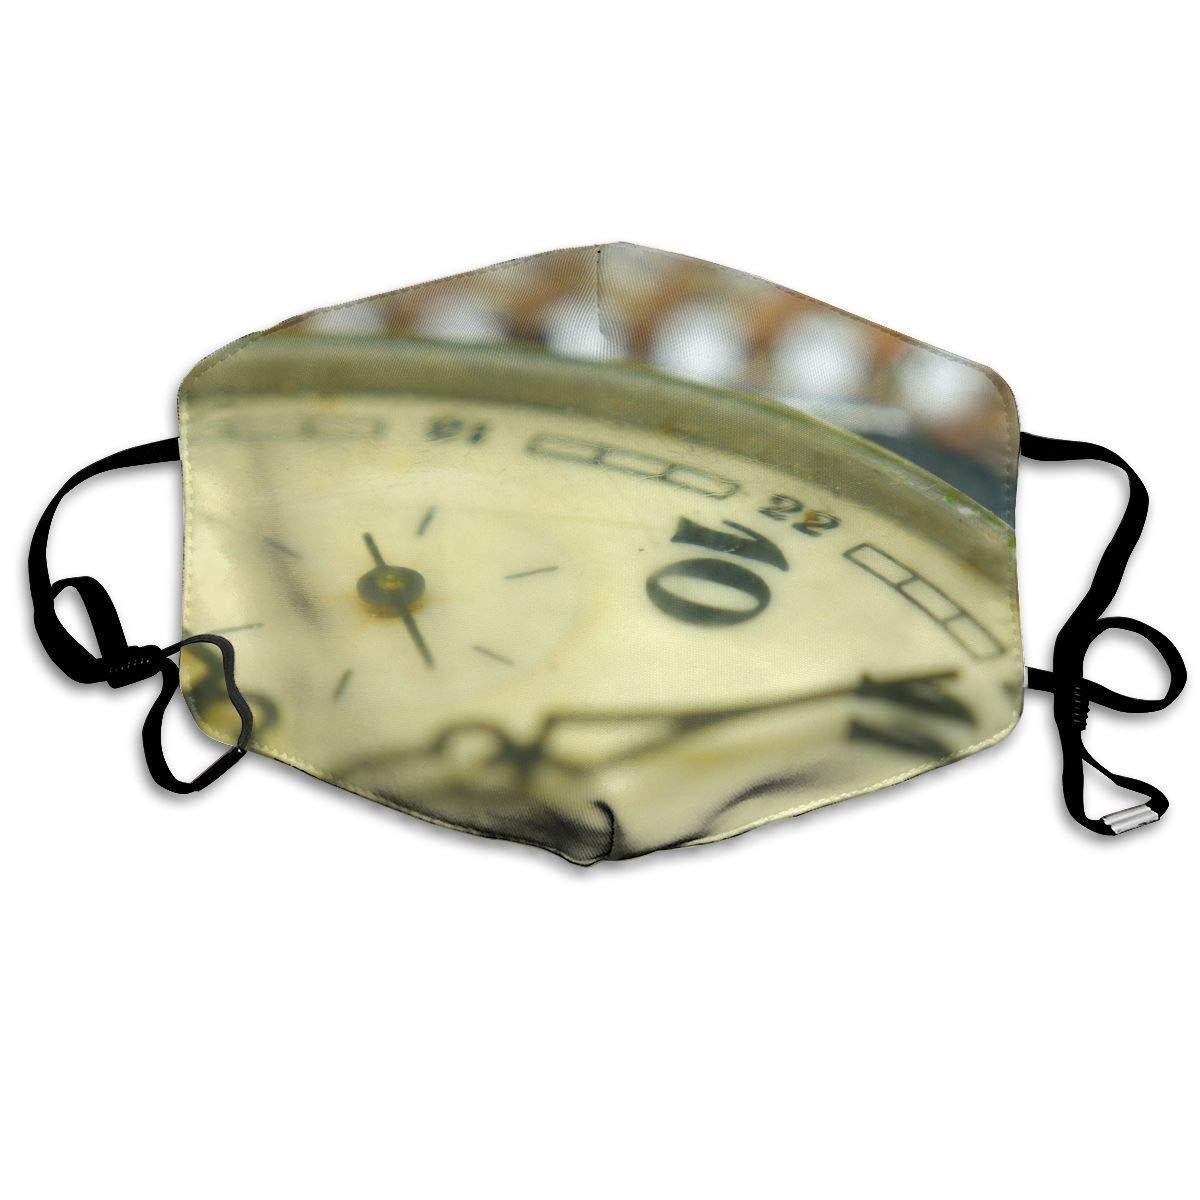 Daawqee Máscara de Boca, Vintage Pocket Watch Closeup Adult Creative Mascarilla Washable Safety 100% Polyester Comfortable Breathable Health Half Face Masks